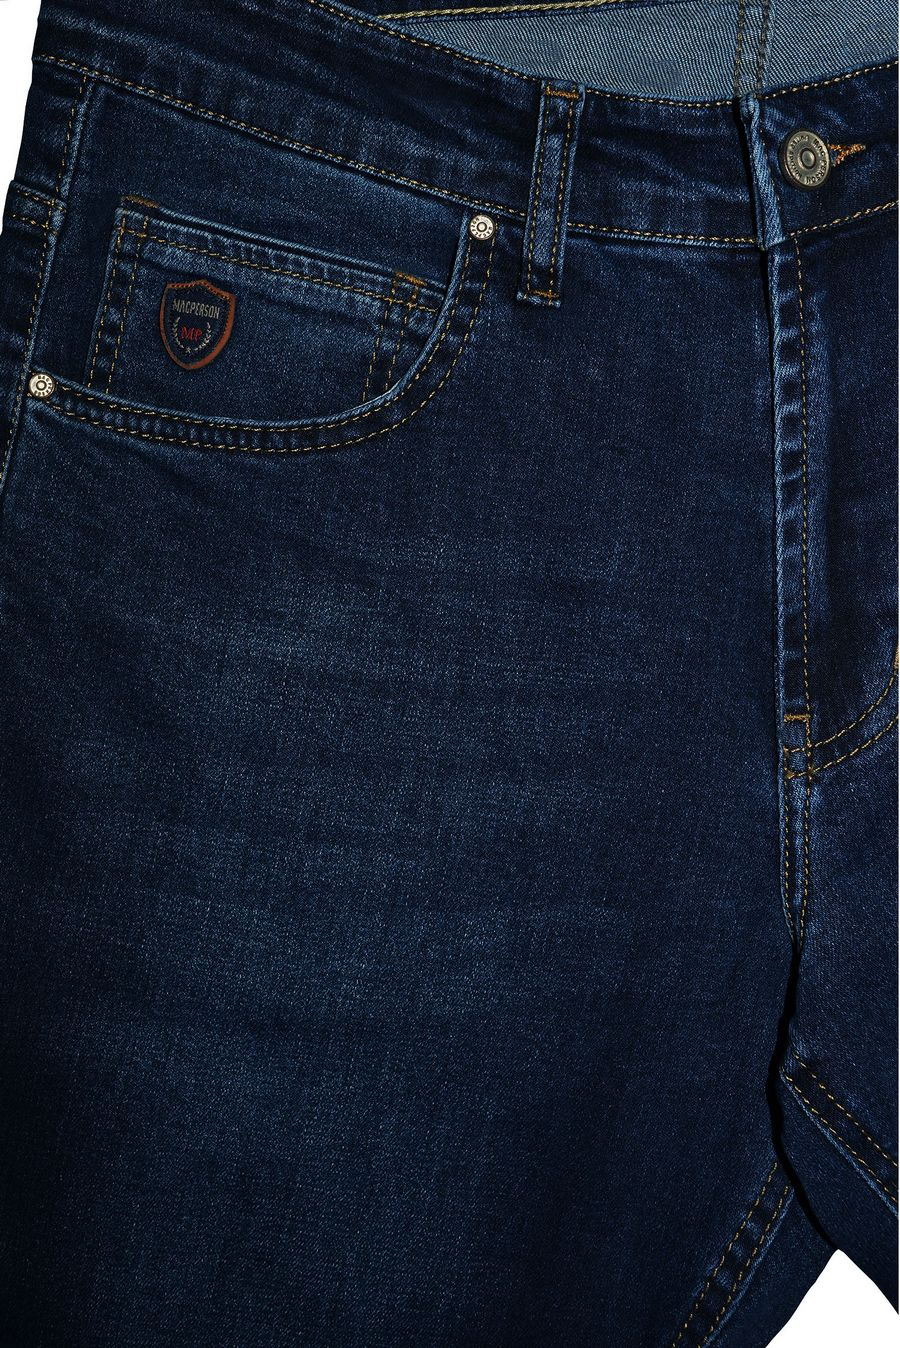 Джинсы мужские MAC Person 2923-12321 Blue Blue - фото 3